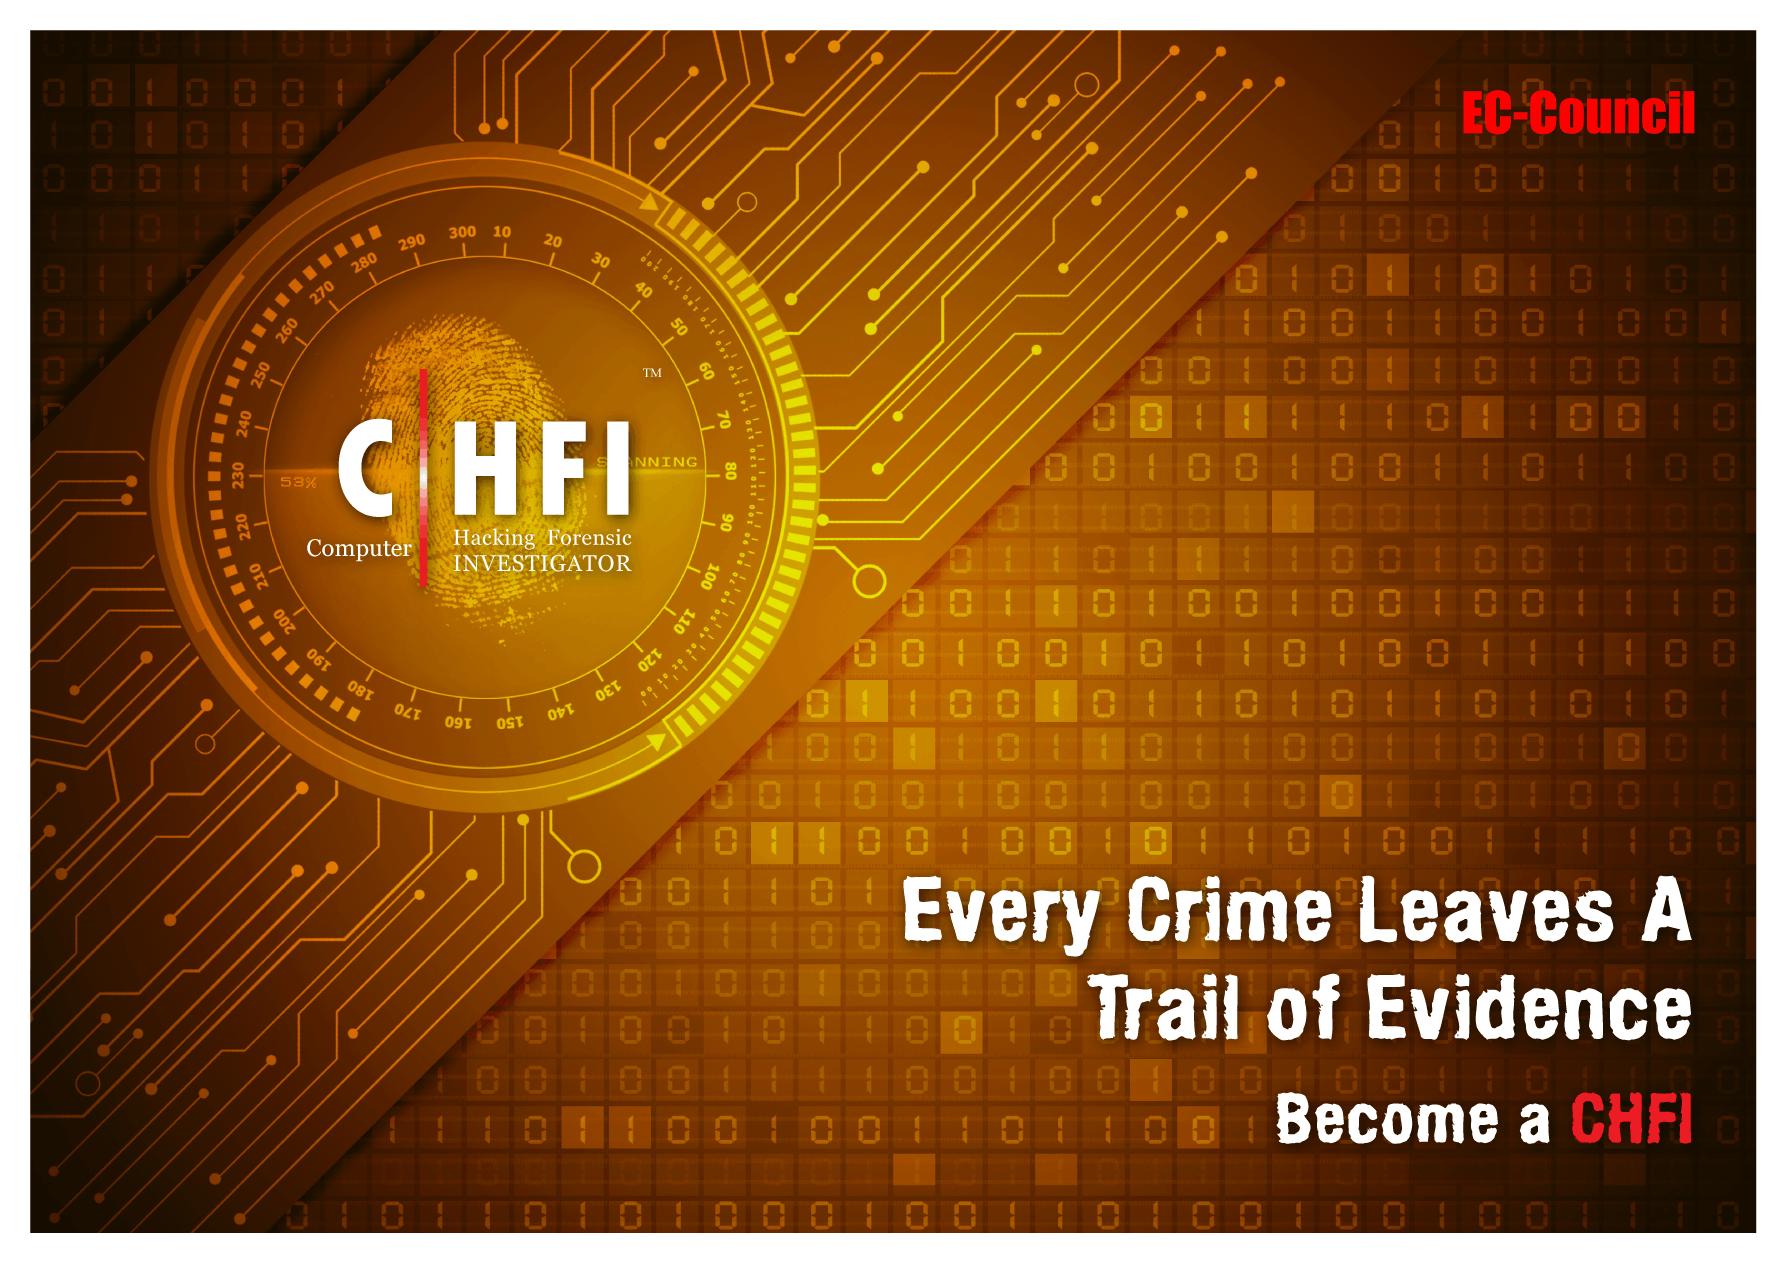 Computer Hacking Forensic Investigator Chfi Certification Training